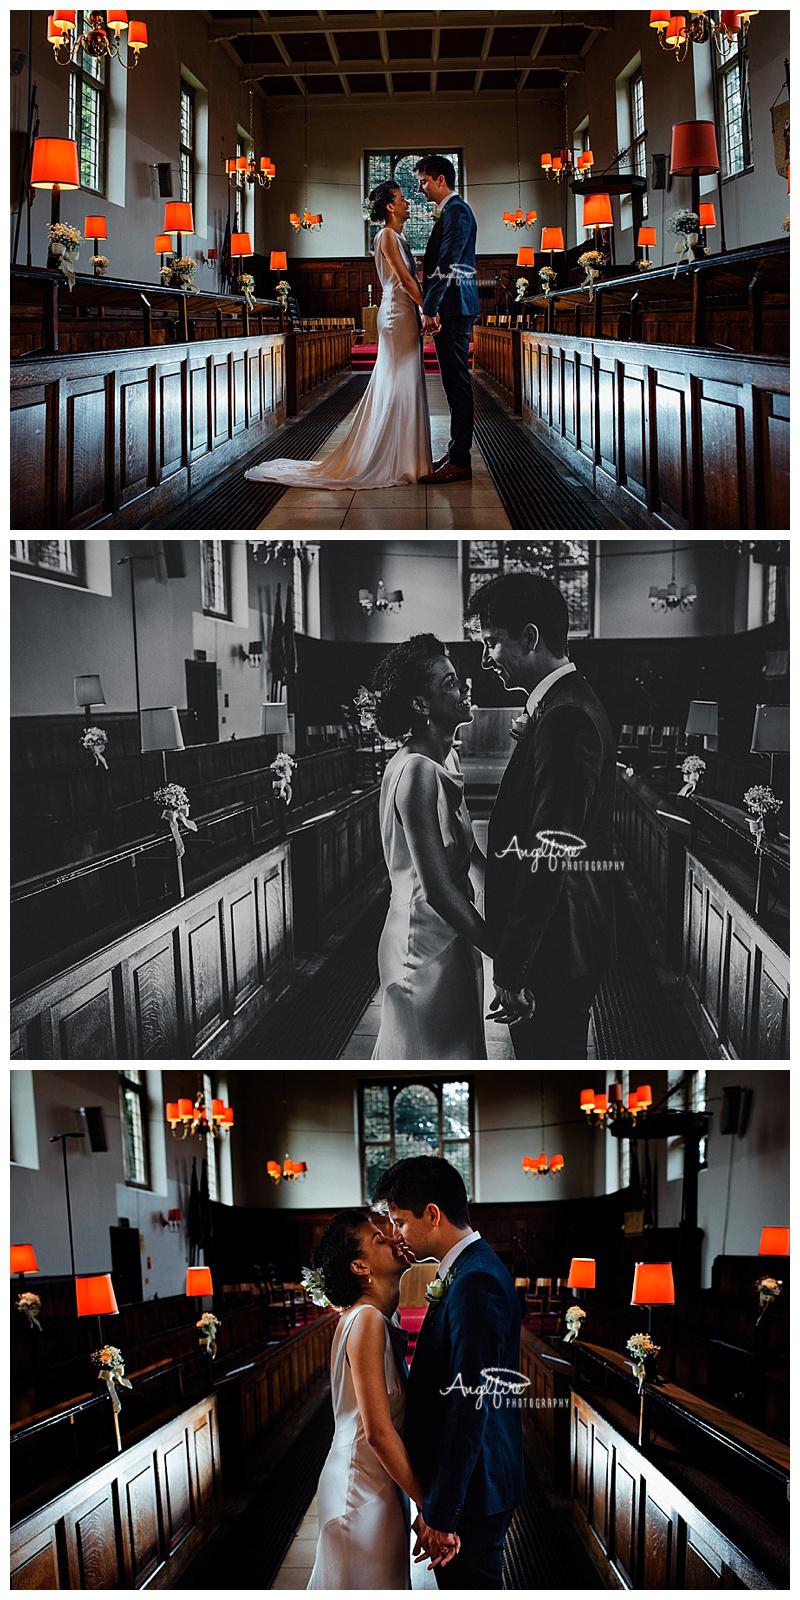 West Midlands Wedding Photographer | Angelfire Photography | www.angelfirephotography.co.uk 69